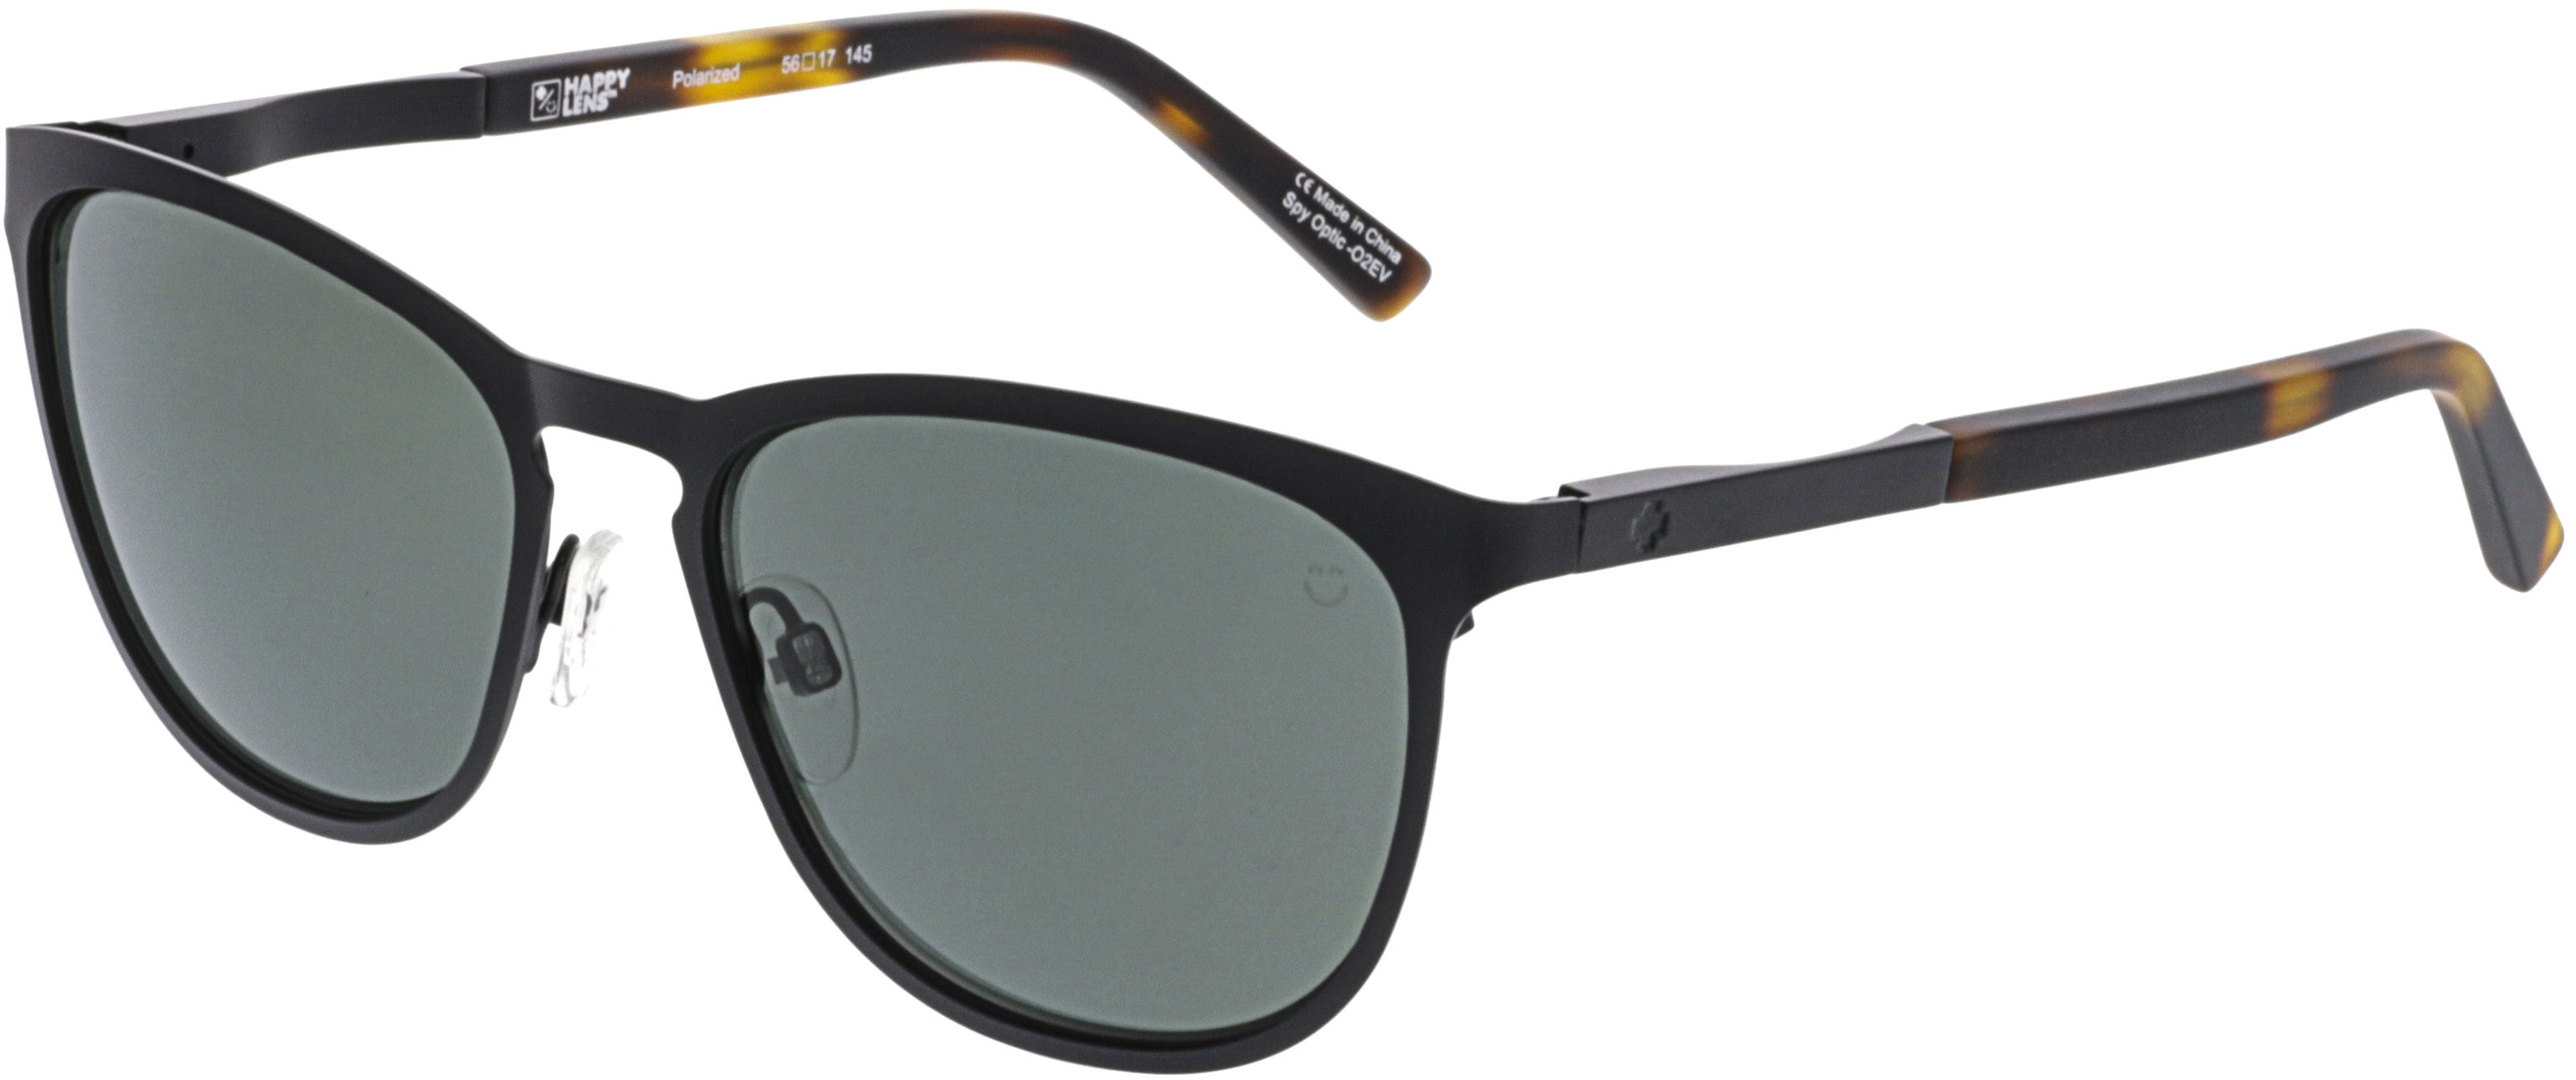 c180321a7ce04 Details about NEW Spy Optics Cliffside Matte Black   Happy Gray Green  873500764864 Sunglasses